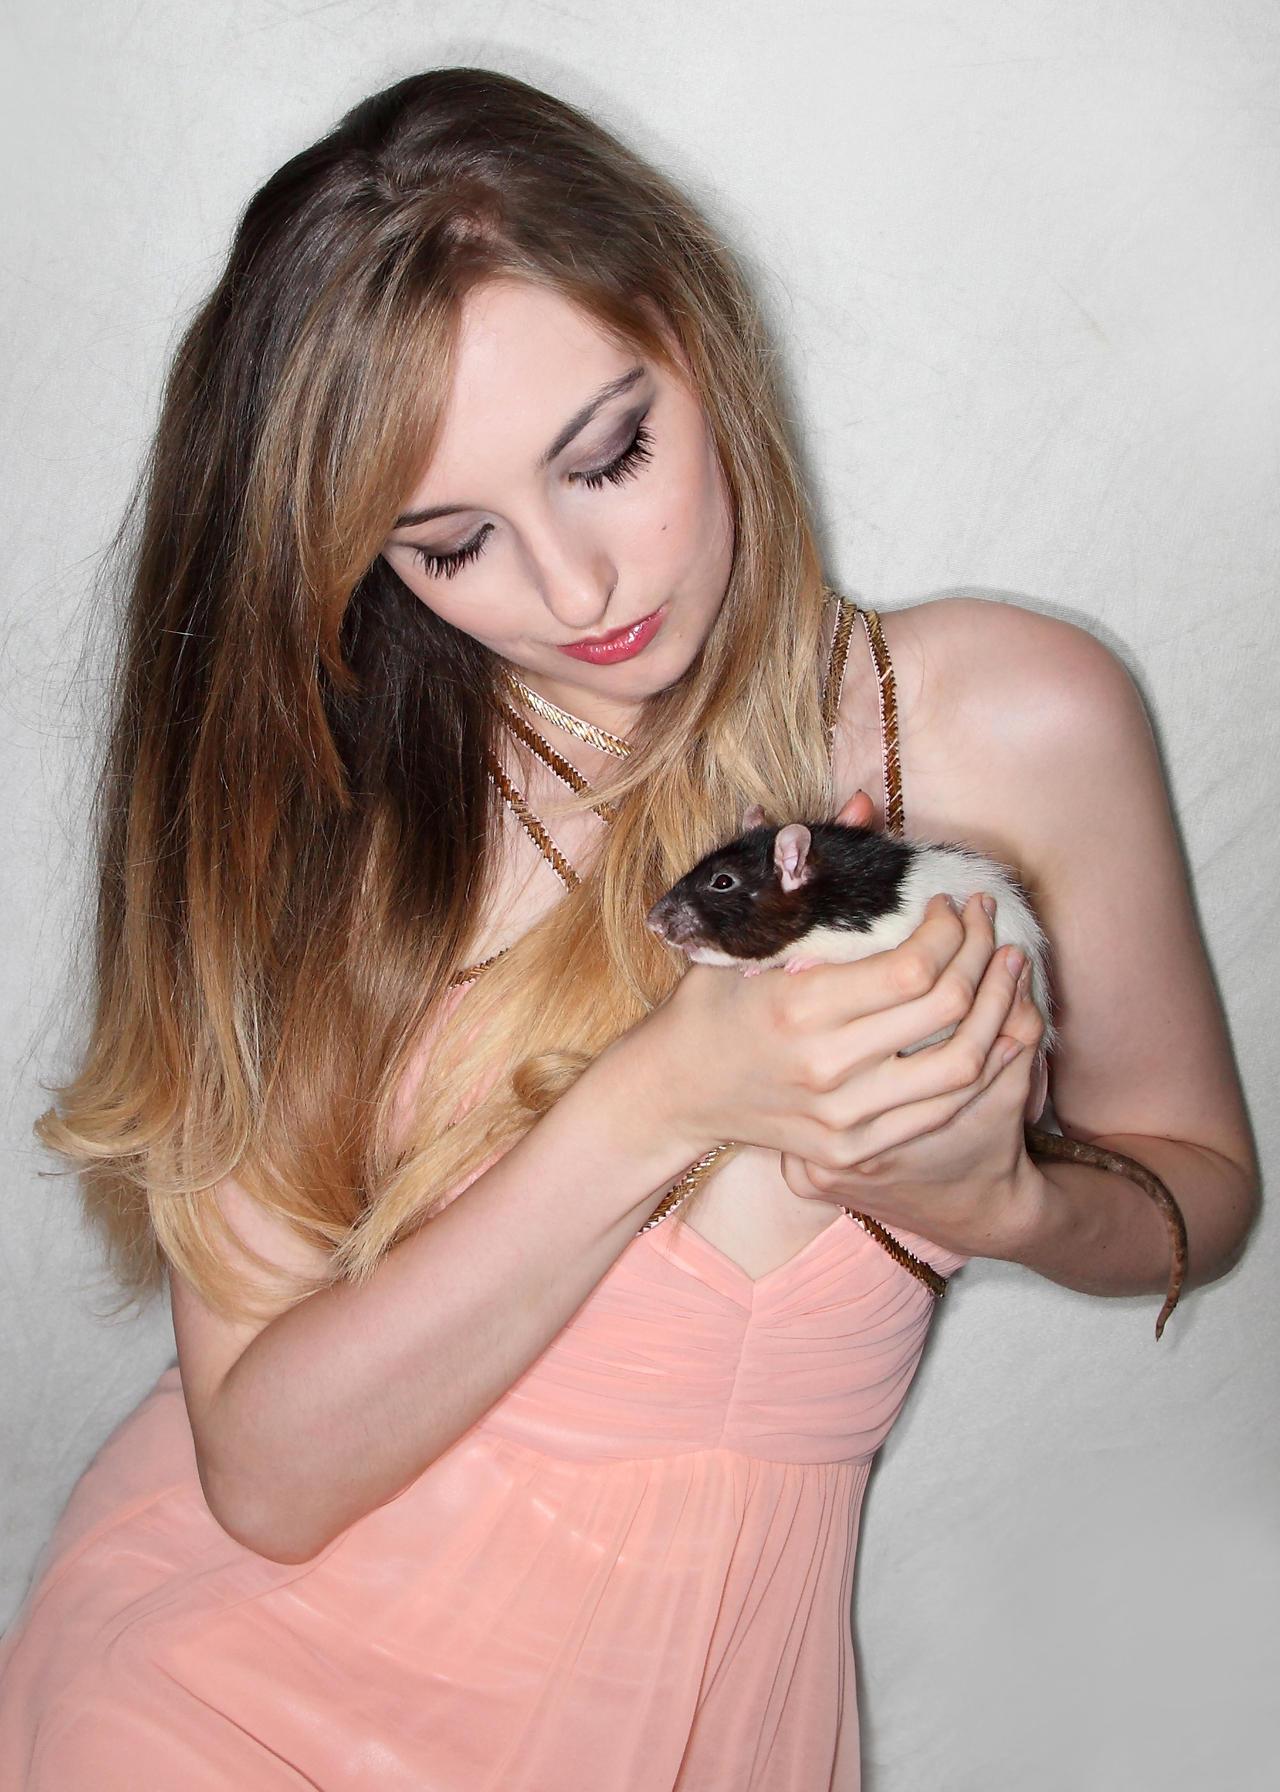 Ratty love stock by NickiStock